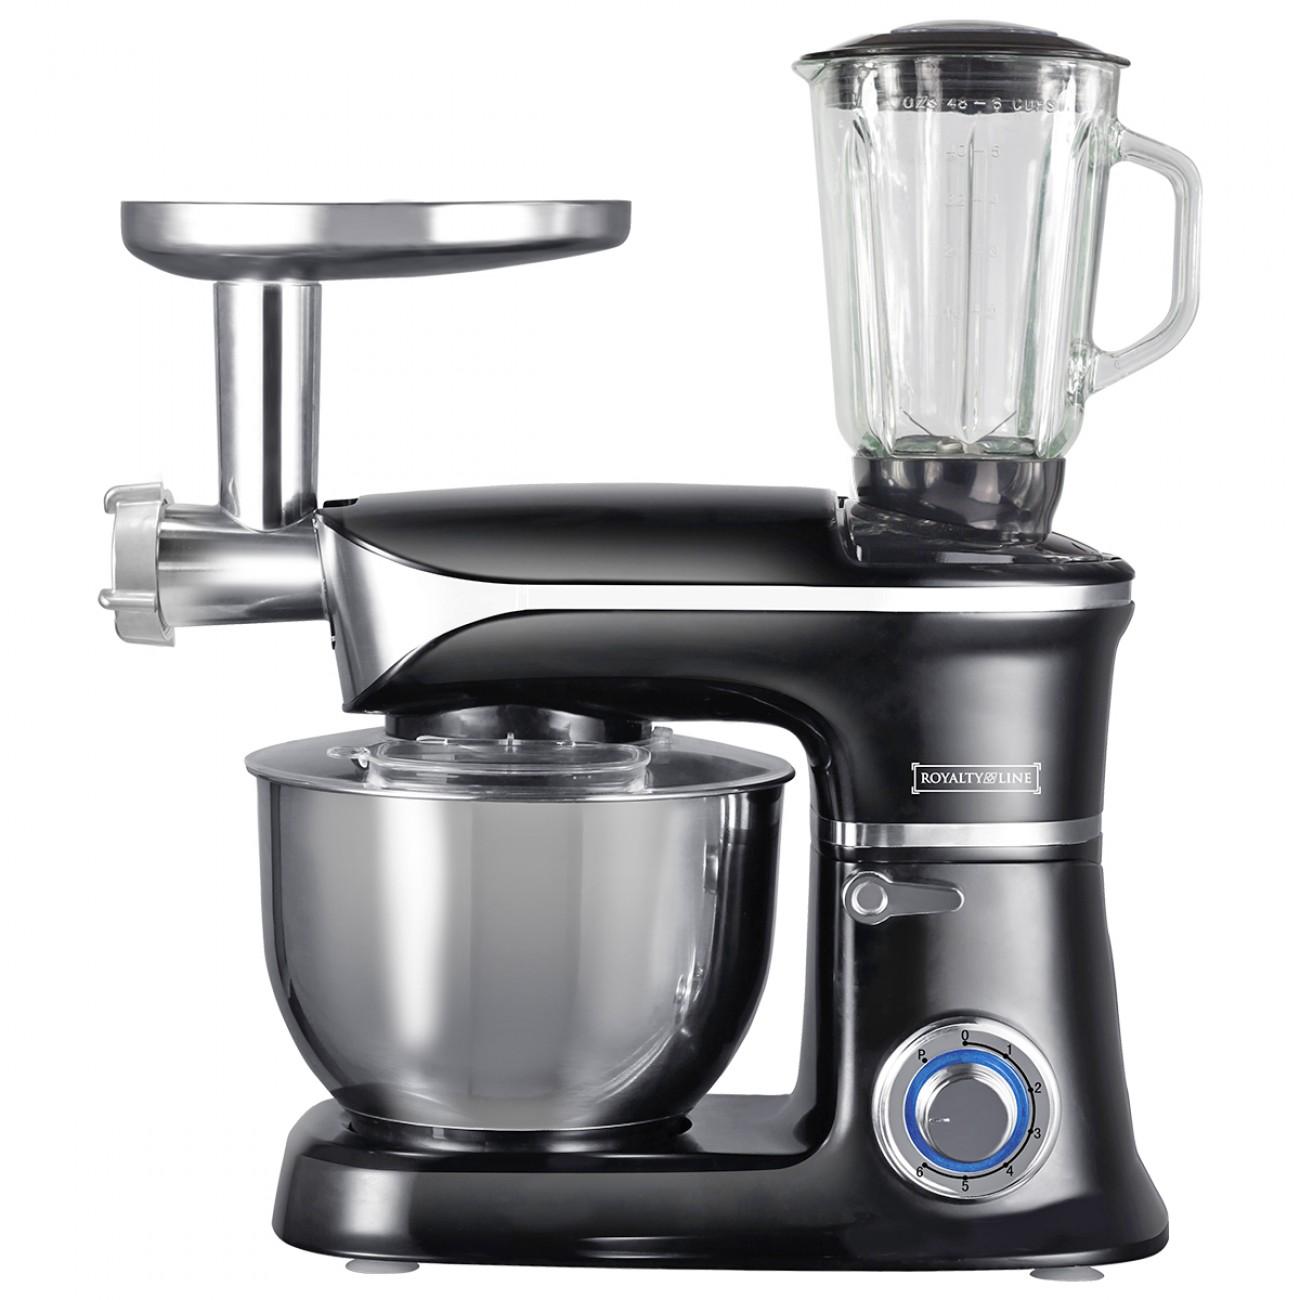 Кухненски робот 3в1 Royalty Line RL-PKM1900.7BG, 1900W, 6,5 литра, Блендер, Миксер, Месомелачка, Черен в Кухненски роботи - ROYALTY LINE | Alleop